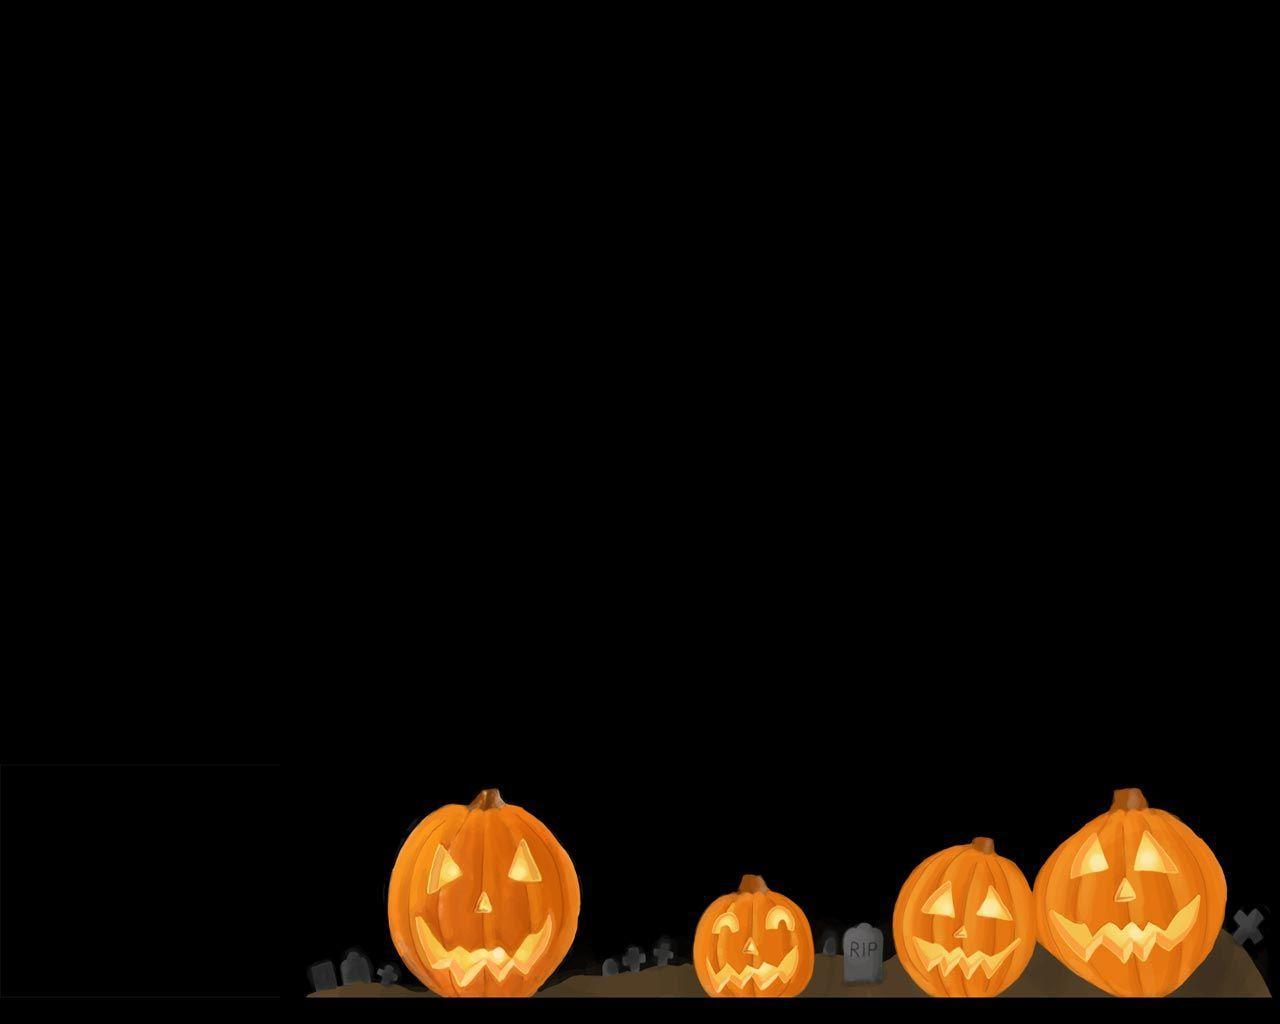 halloween background pics wallpaper cave